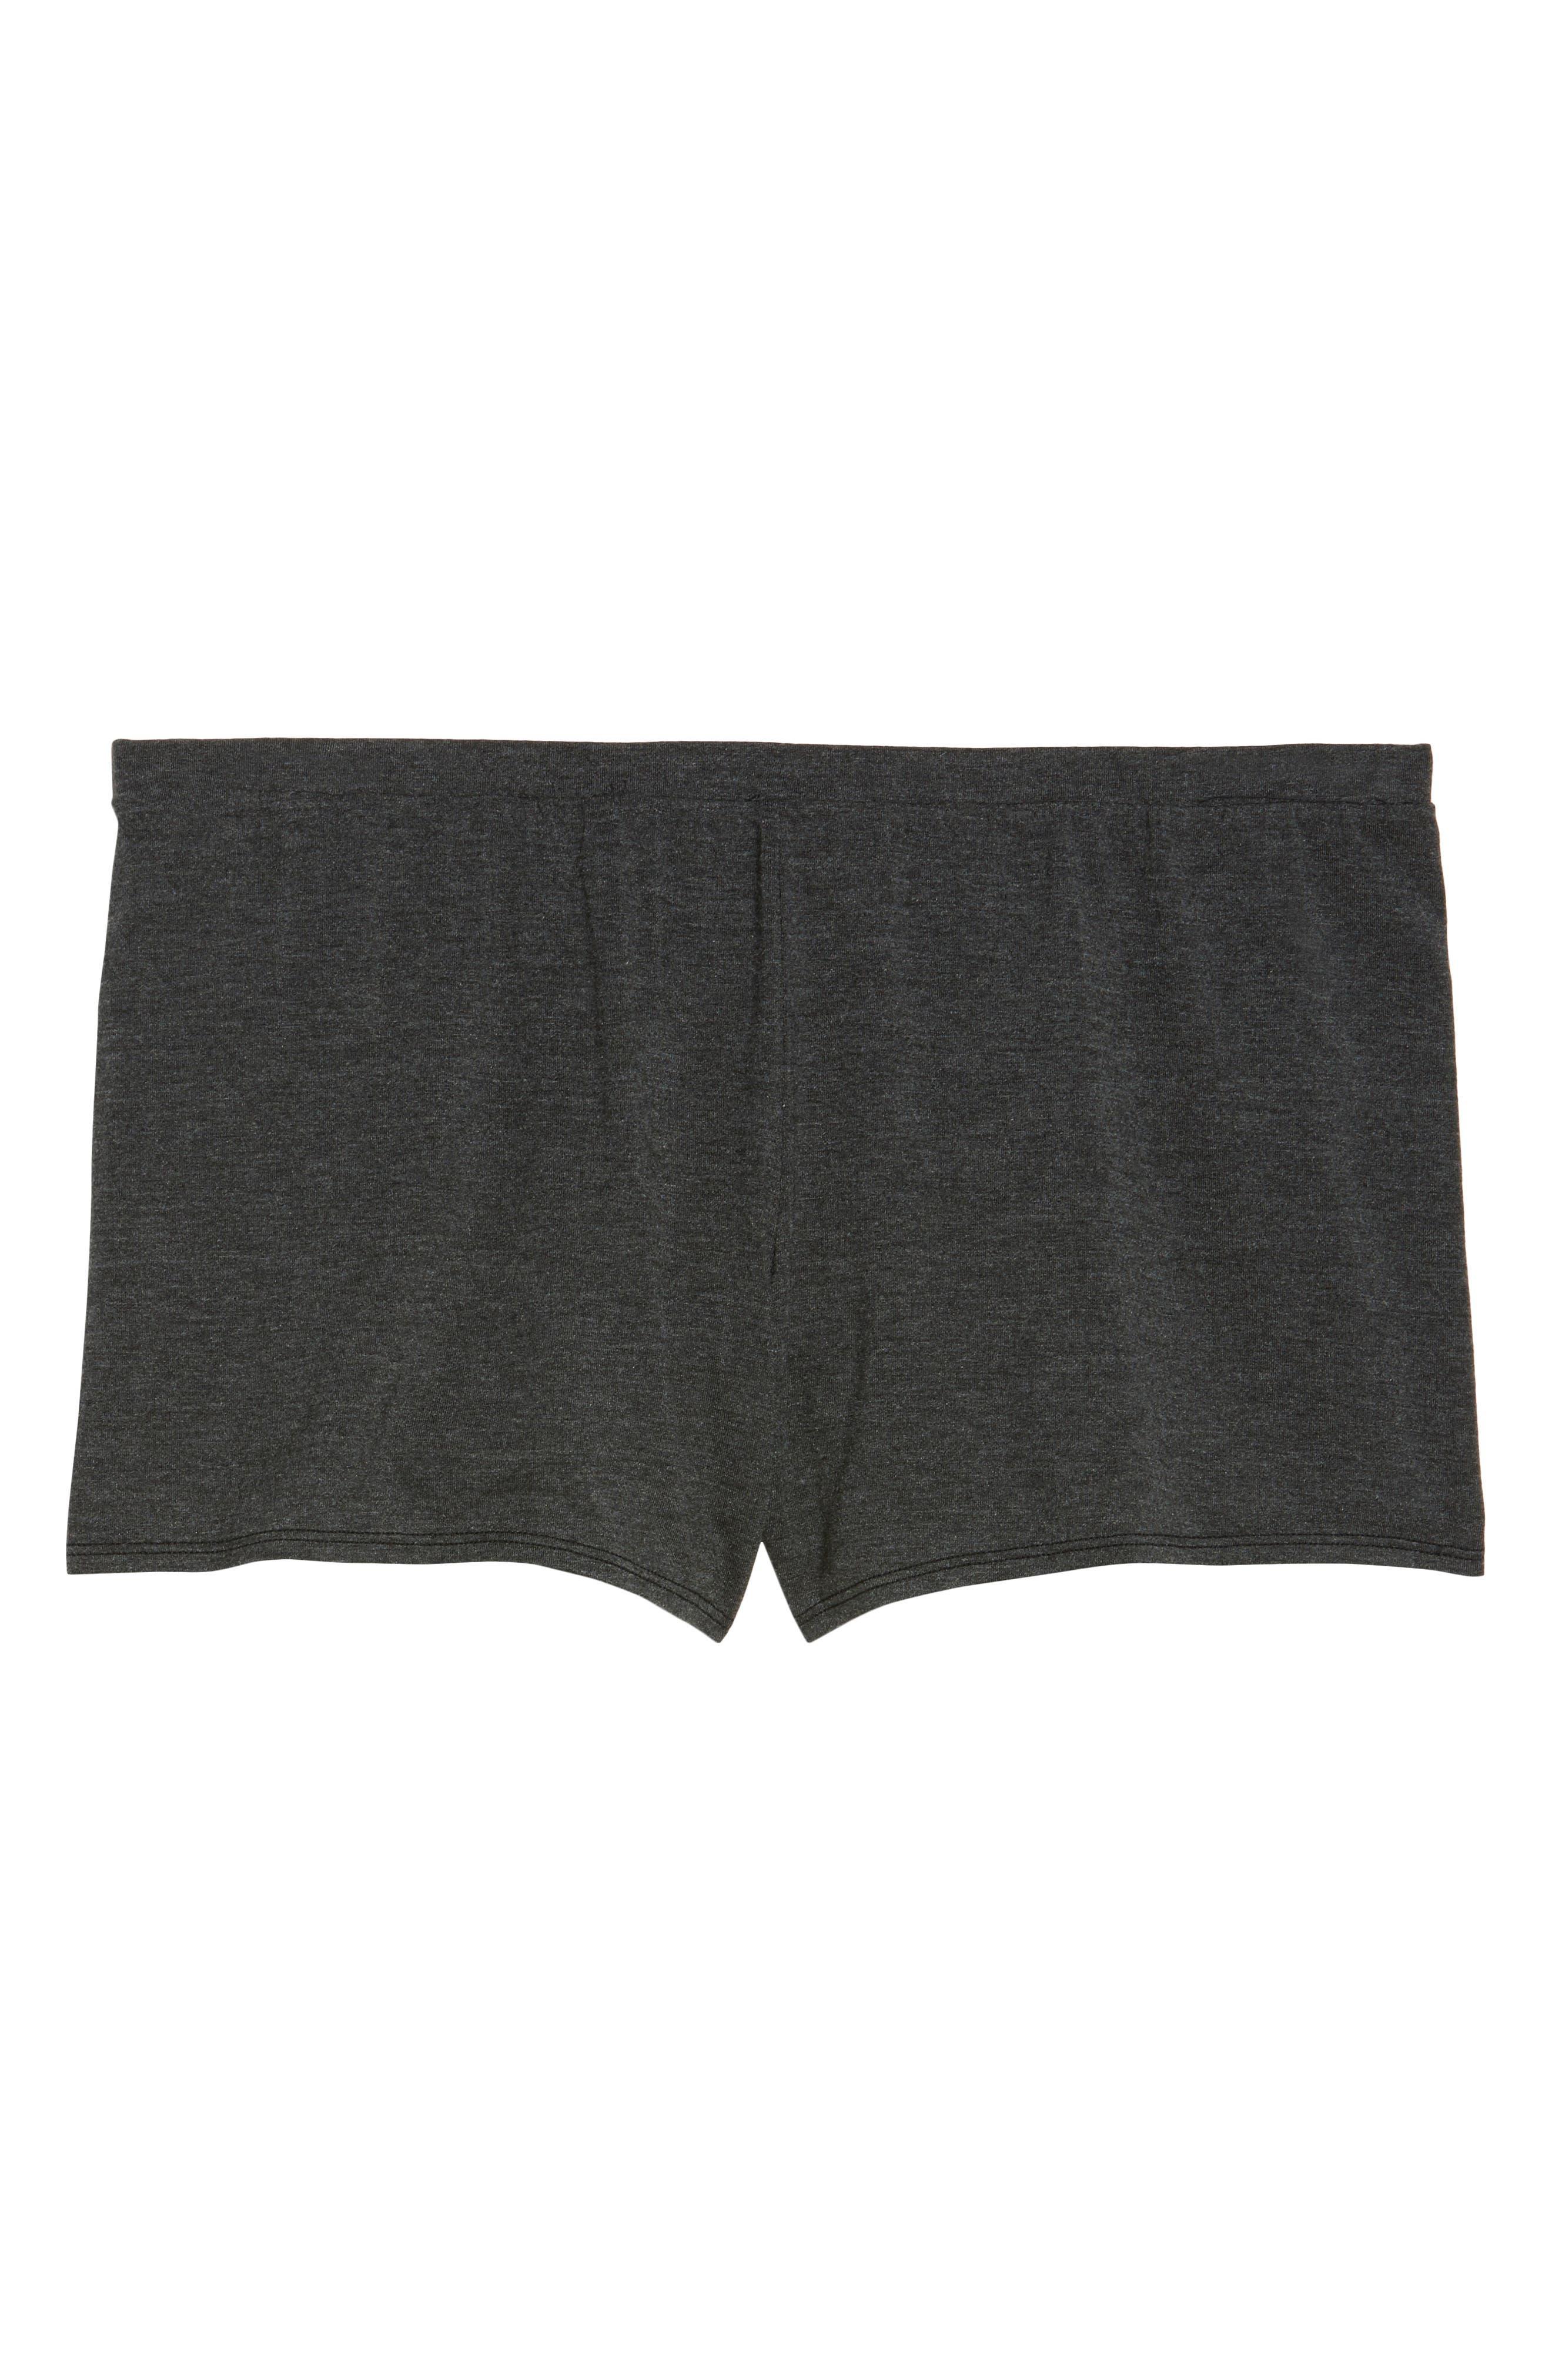 Undressed Pajama Shorts,                             Alternate thumbnail 6, color,                             001